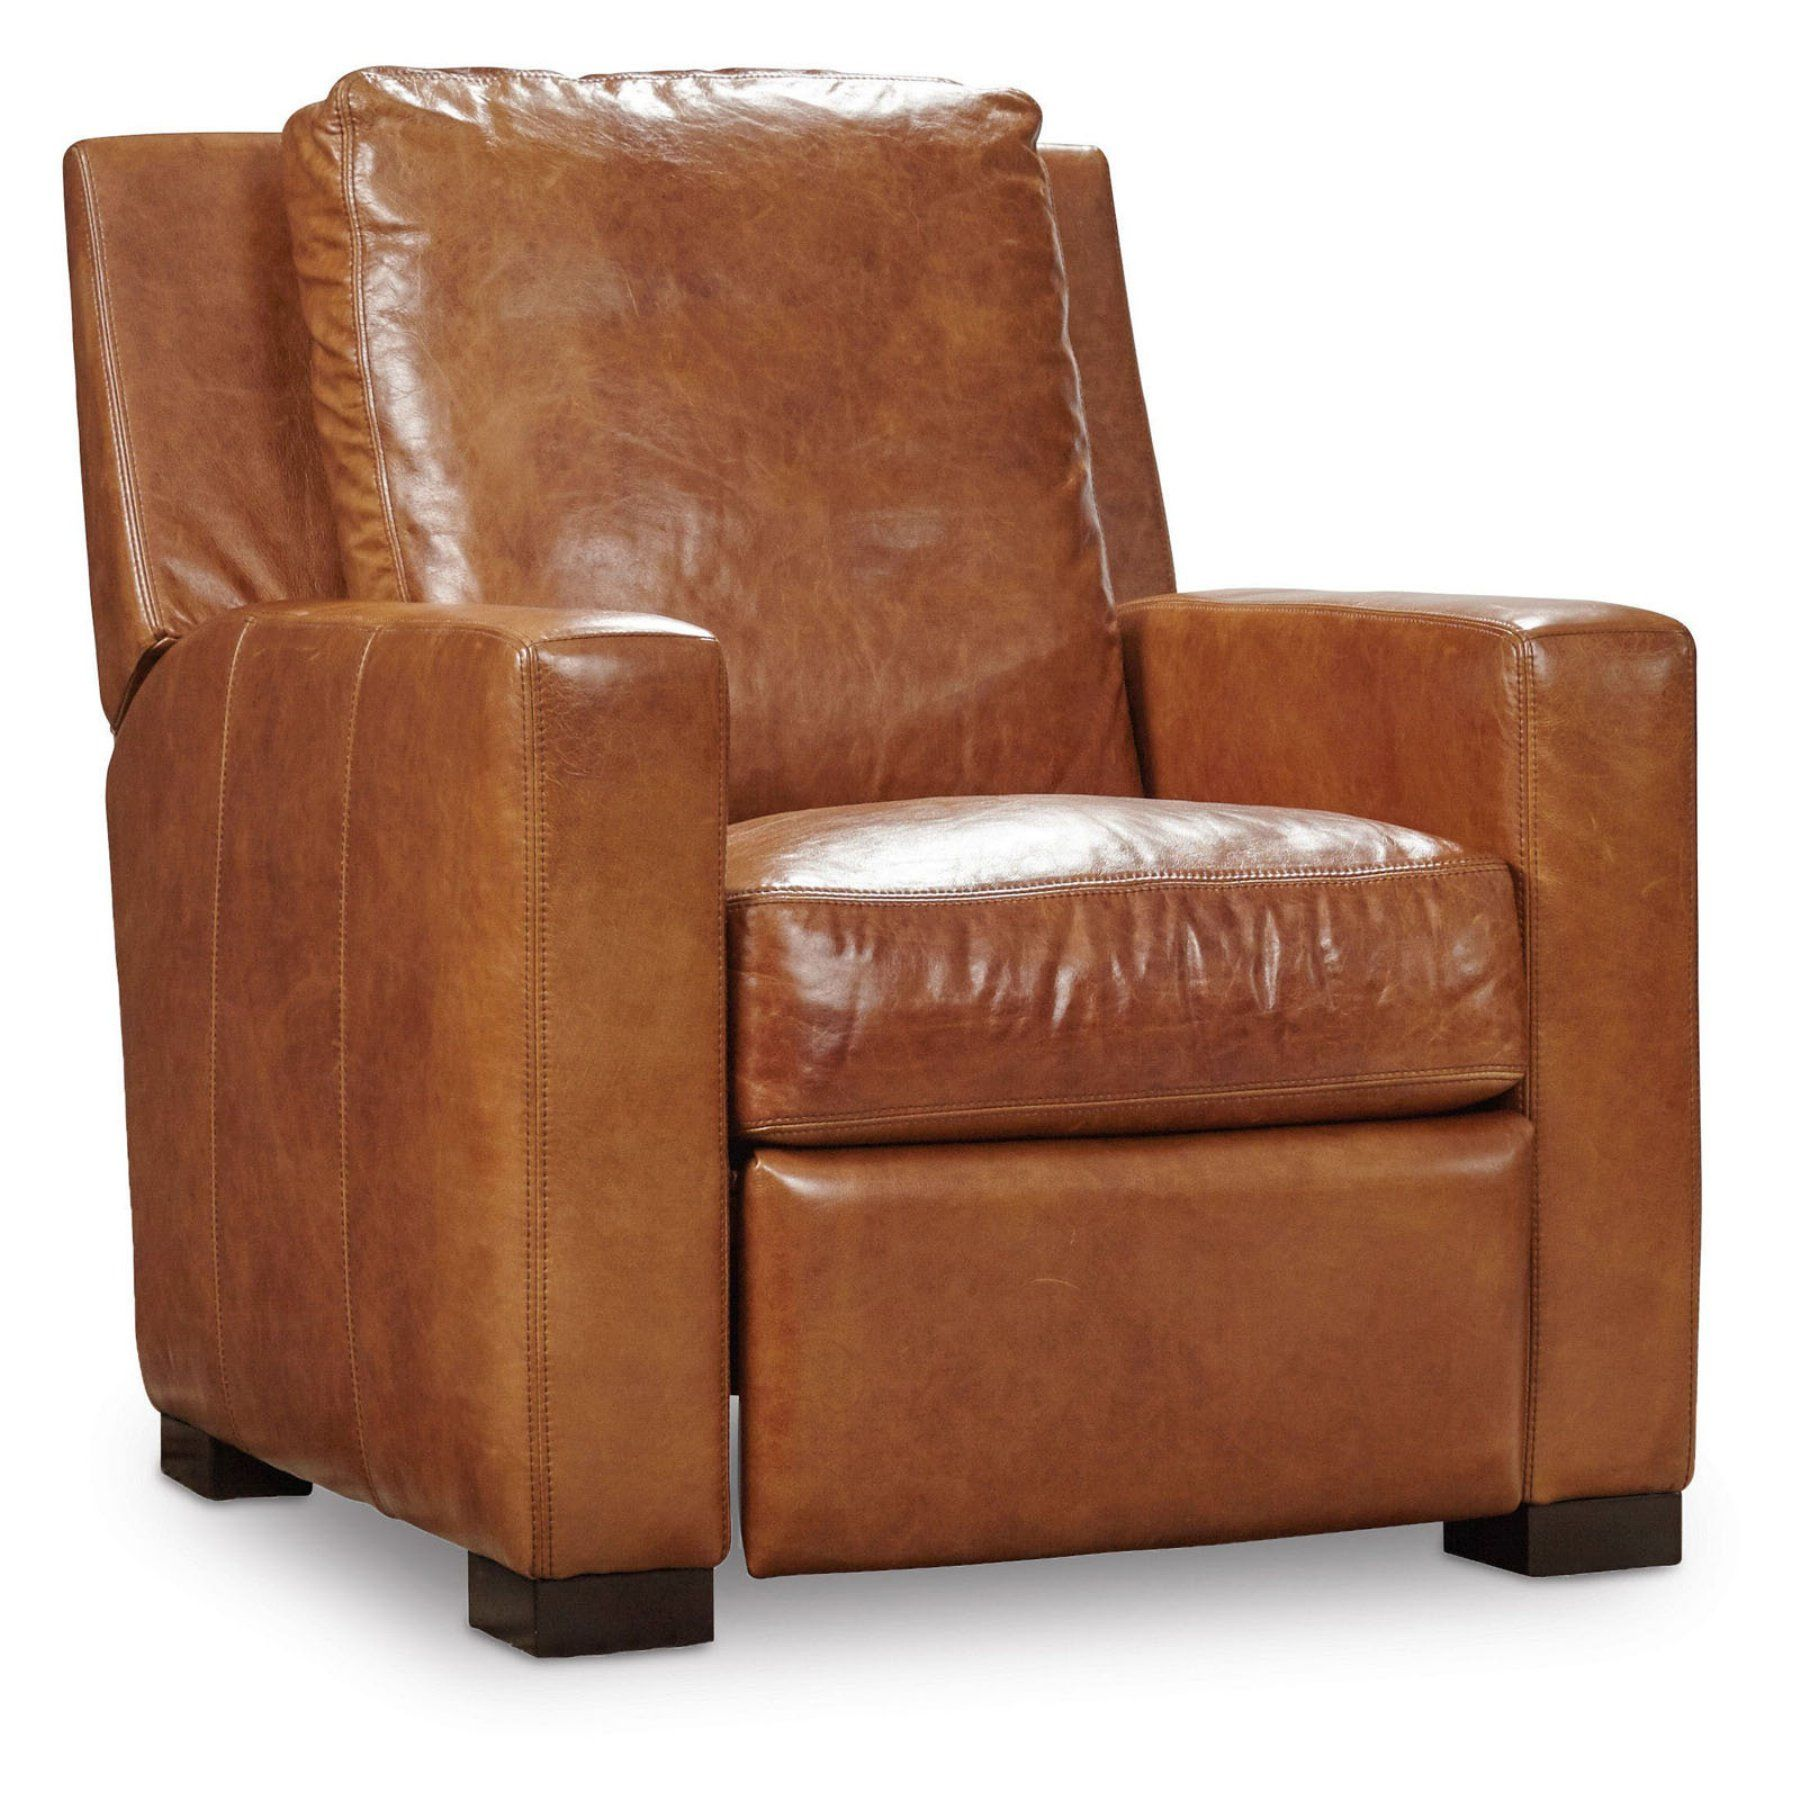 Hooker Furniture Thomas Recliner RC352 084 Pinterest